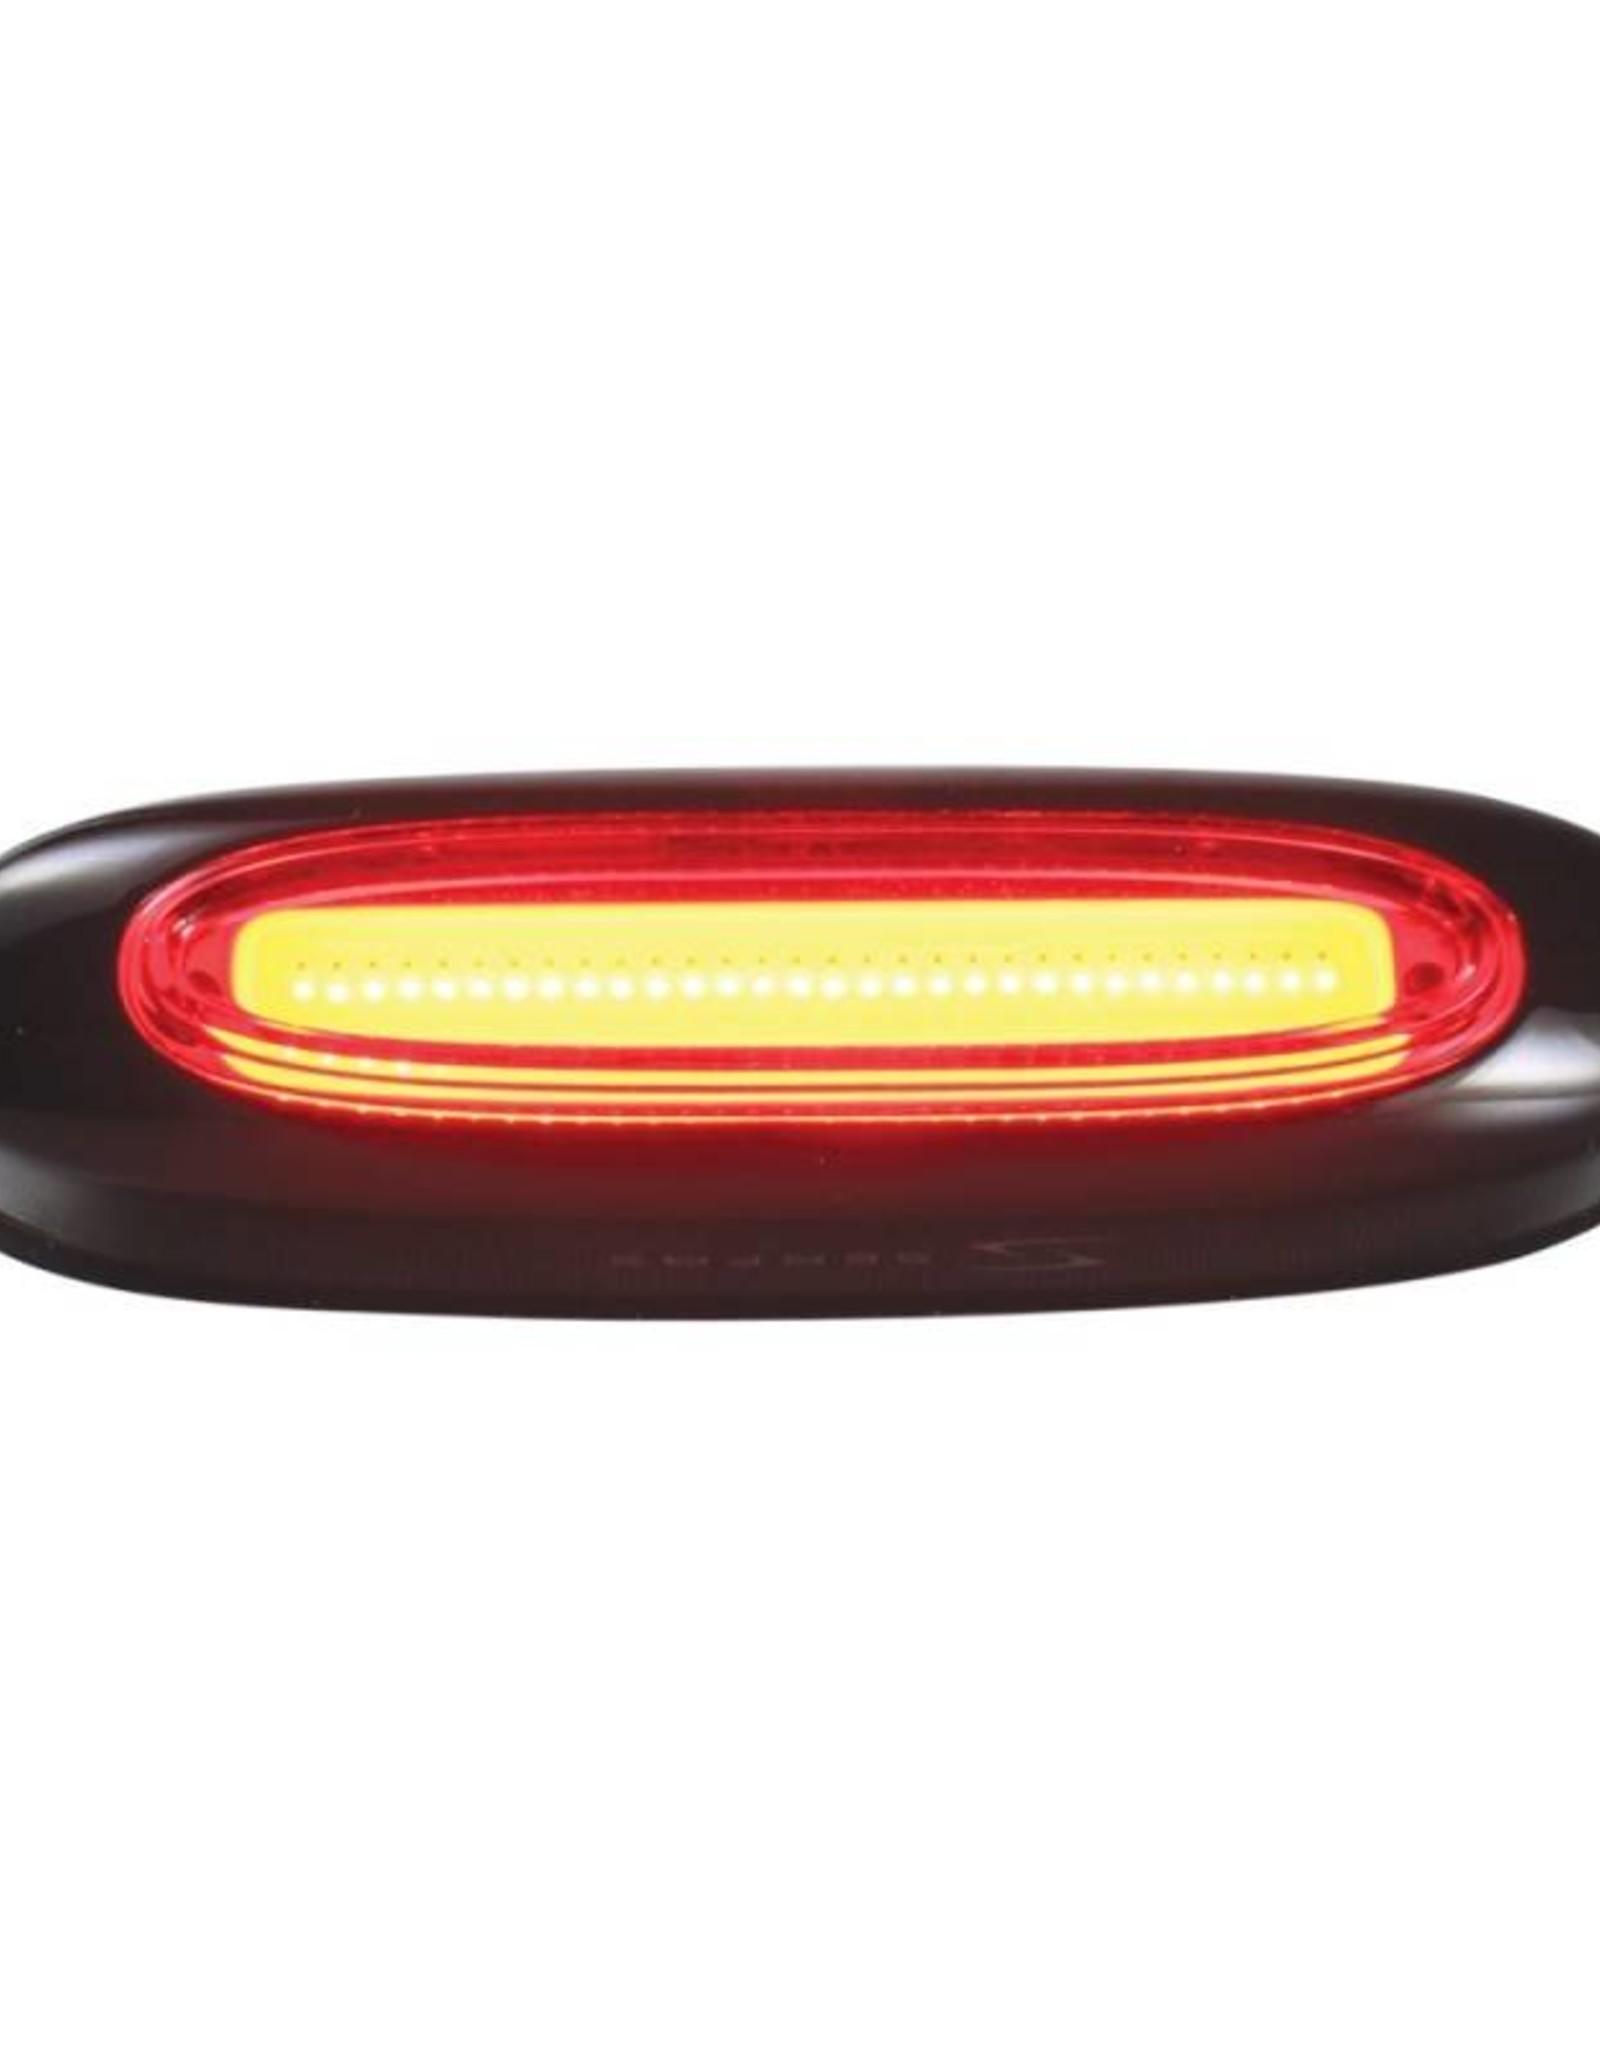 Serfas Serfas Quasar Red Strip Taillight Black